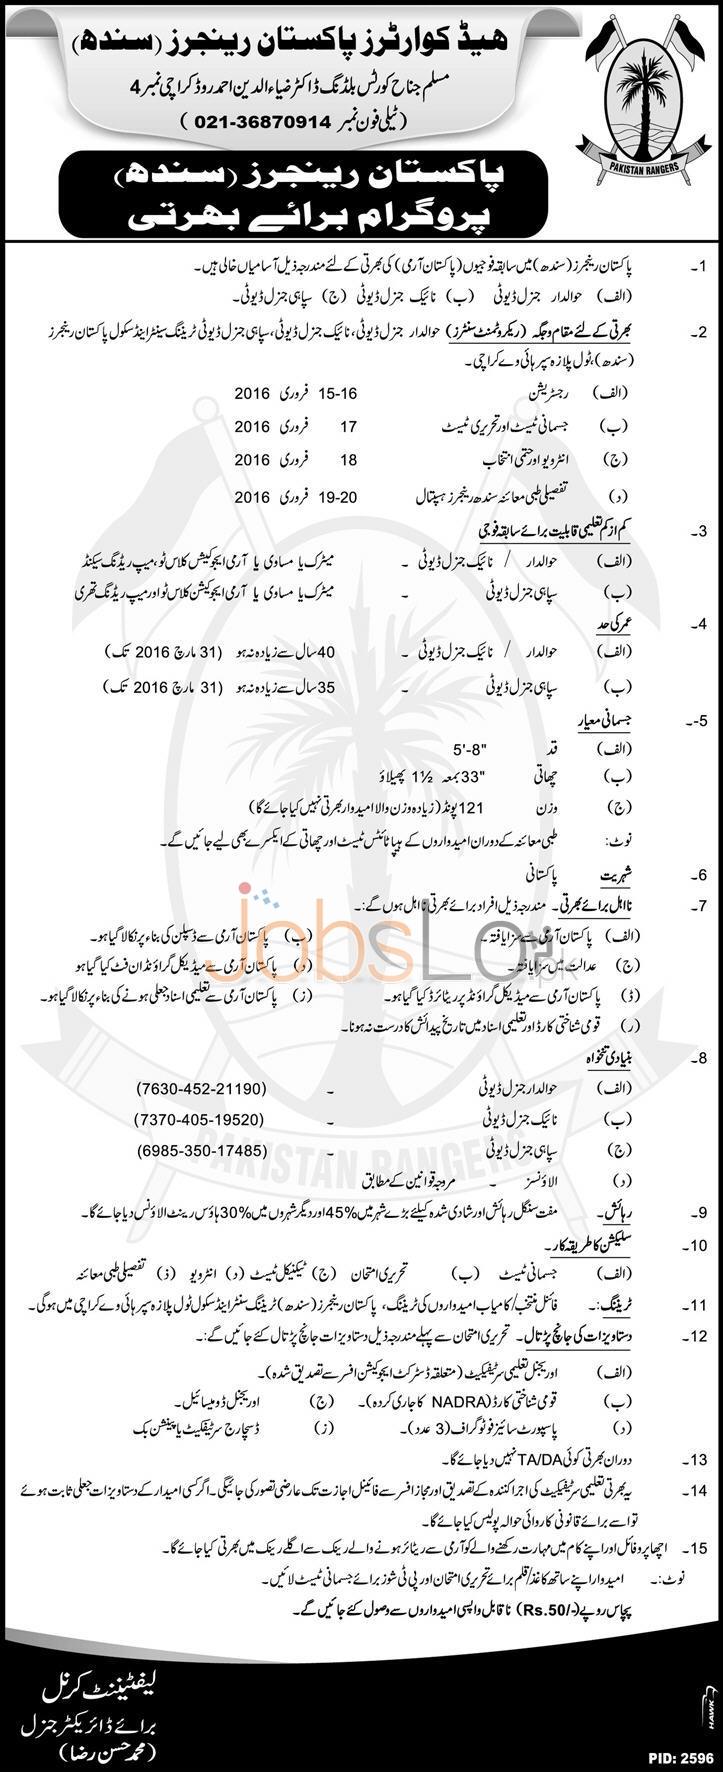 Headquarter Pakistan Rangers Sindh Vacancies in Karachi 2016